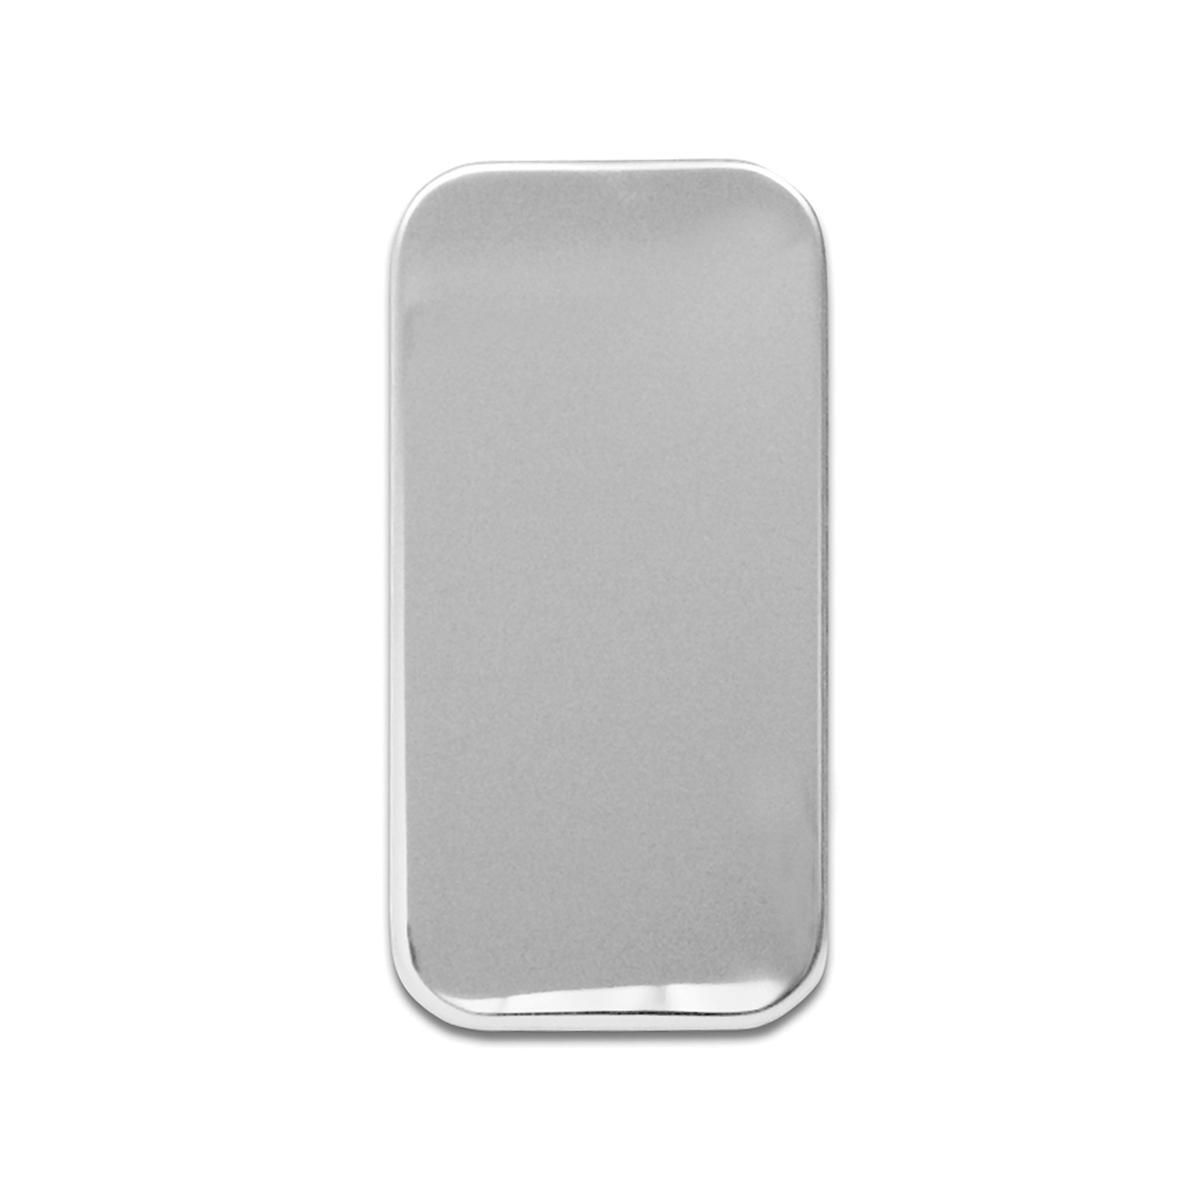 97560 Stainless Steel Exterior Vent Door Cover for Freightliner